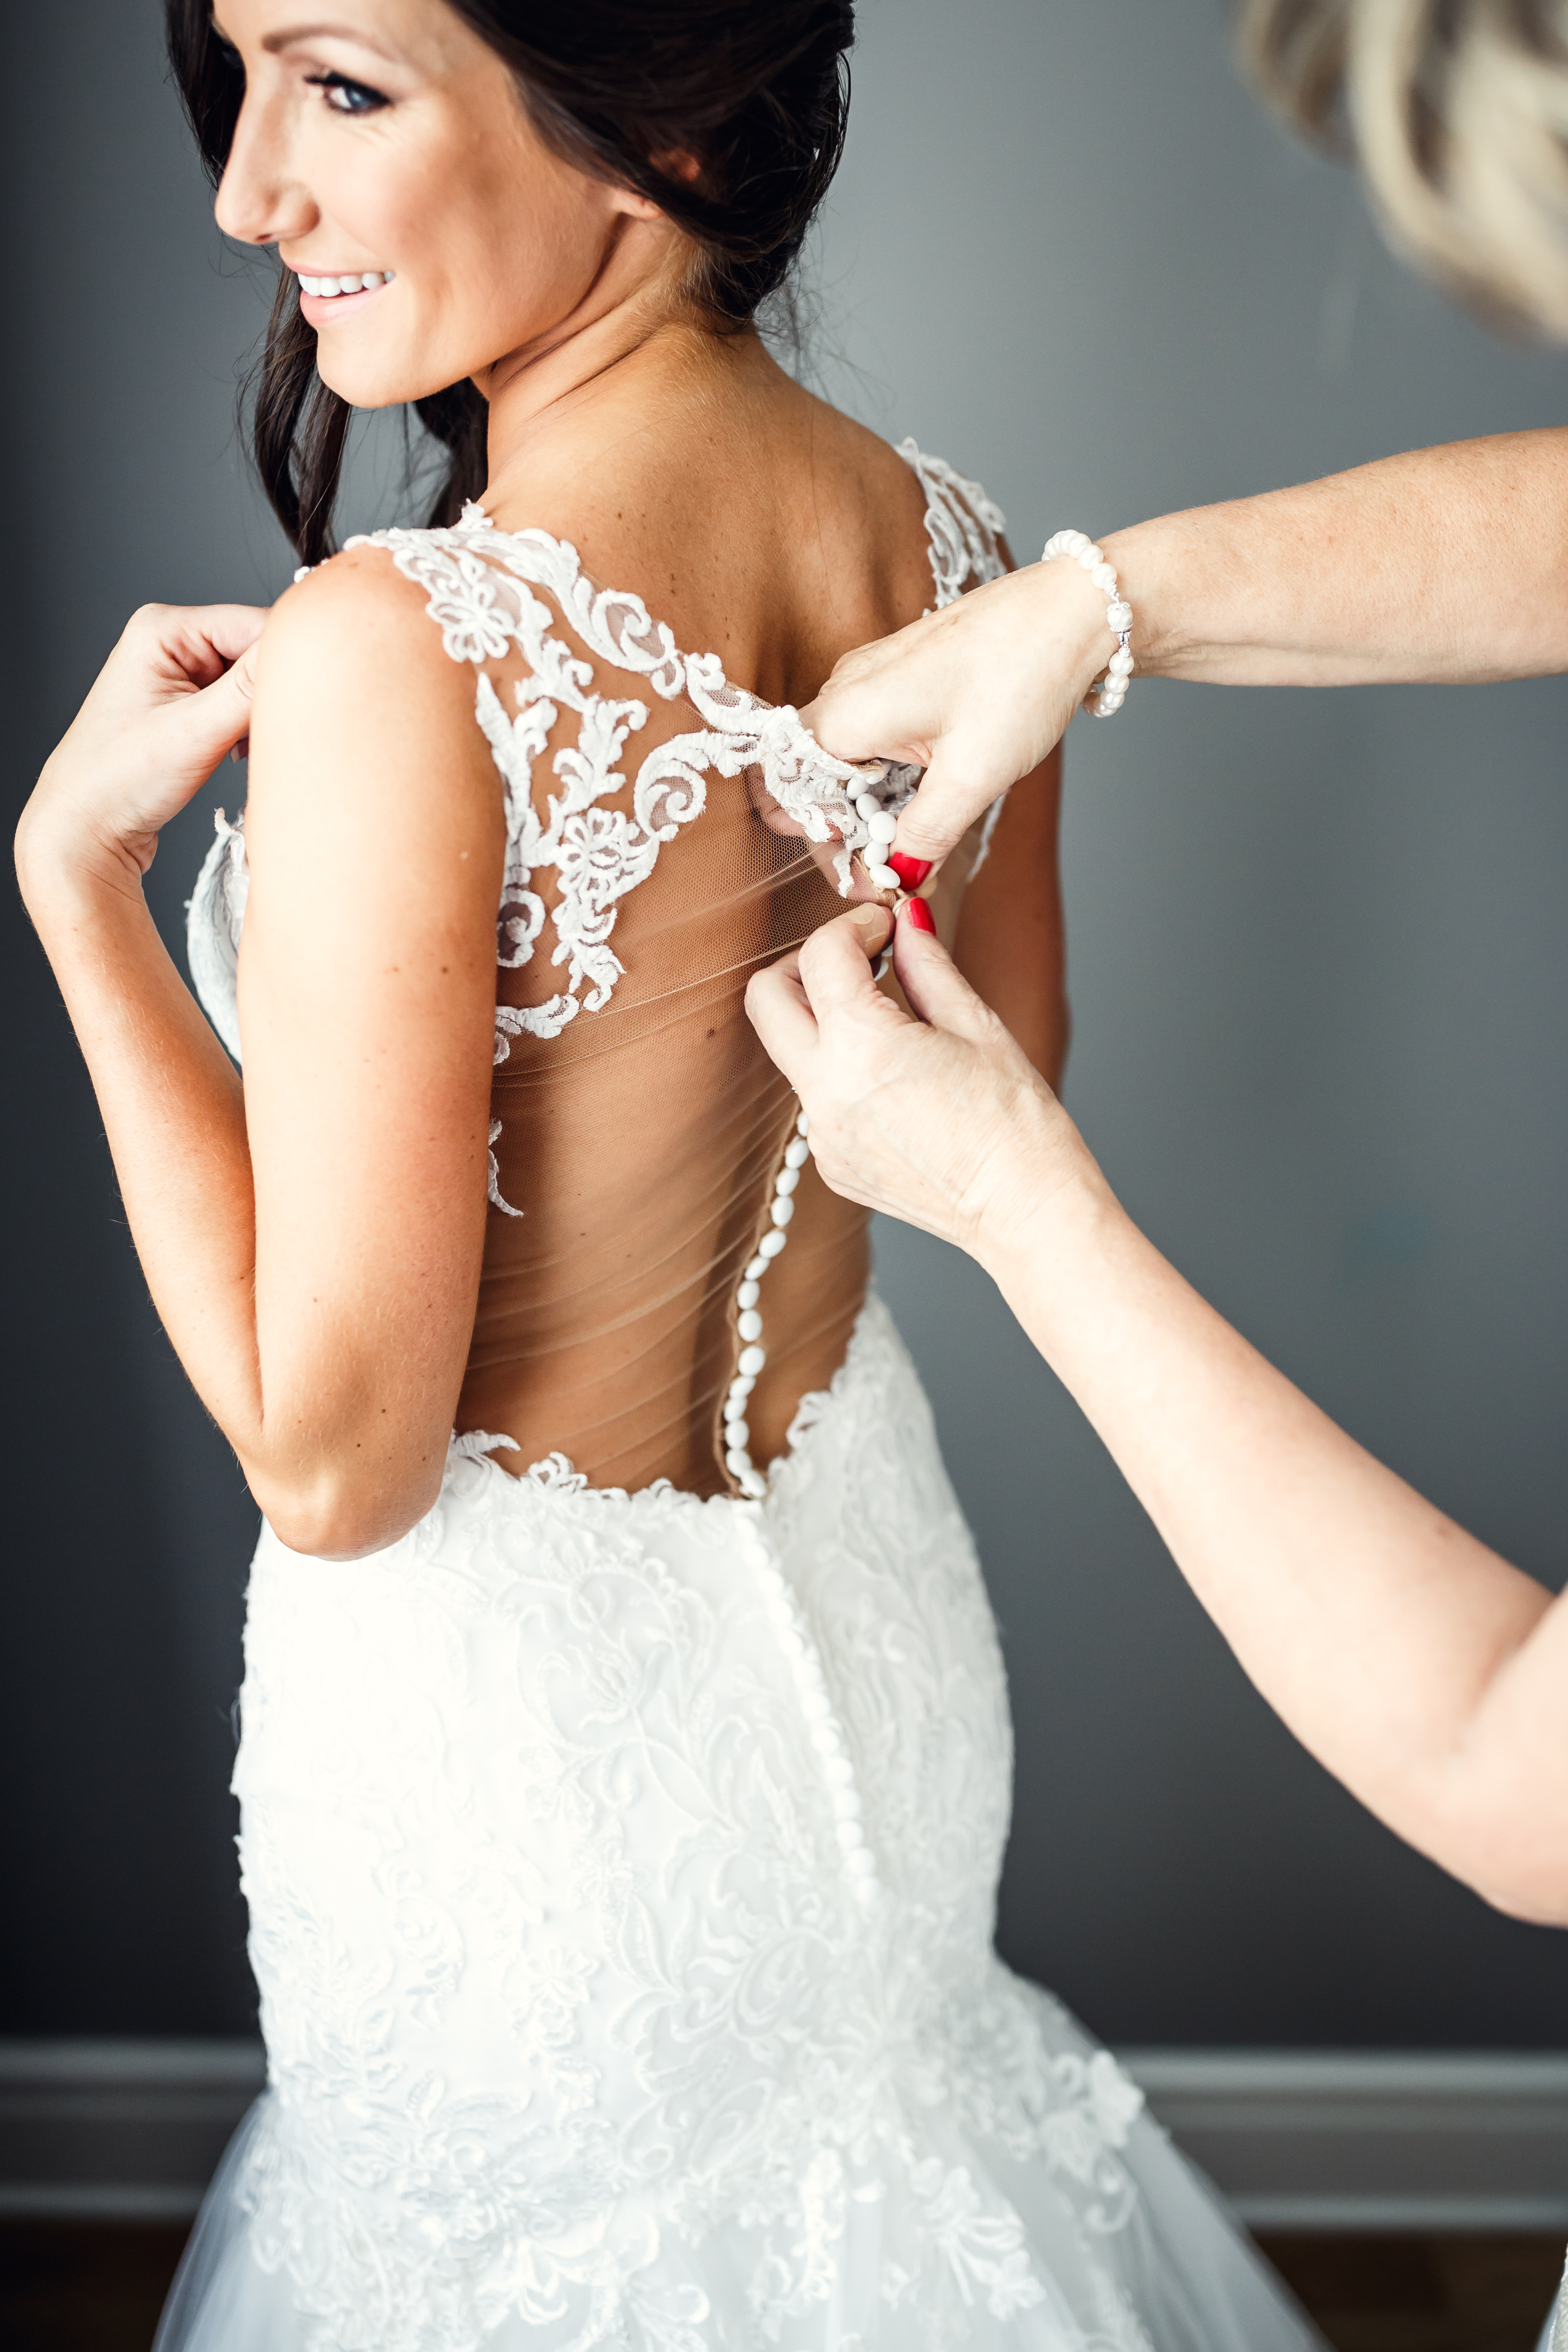 Mariola  Mateusz Wedding Day (39)